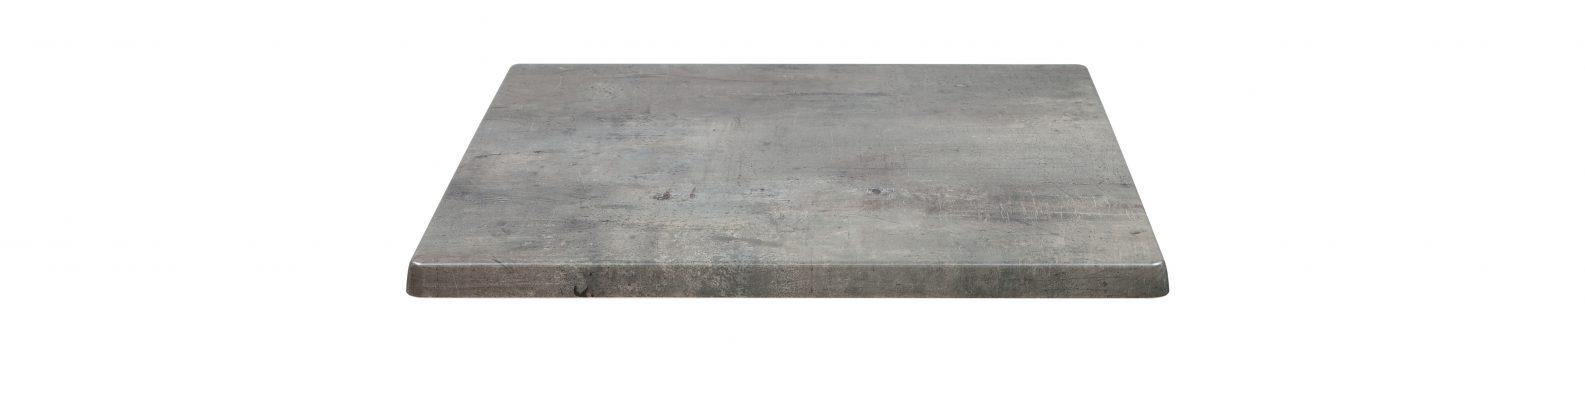 Bordsskiva 70x70cm, concrete, Xirbi